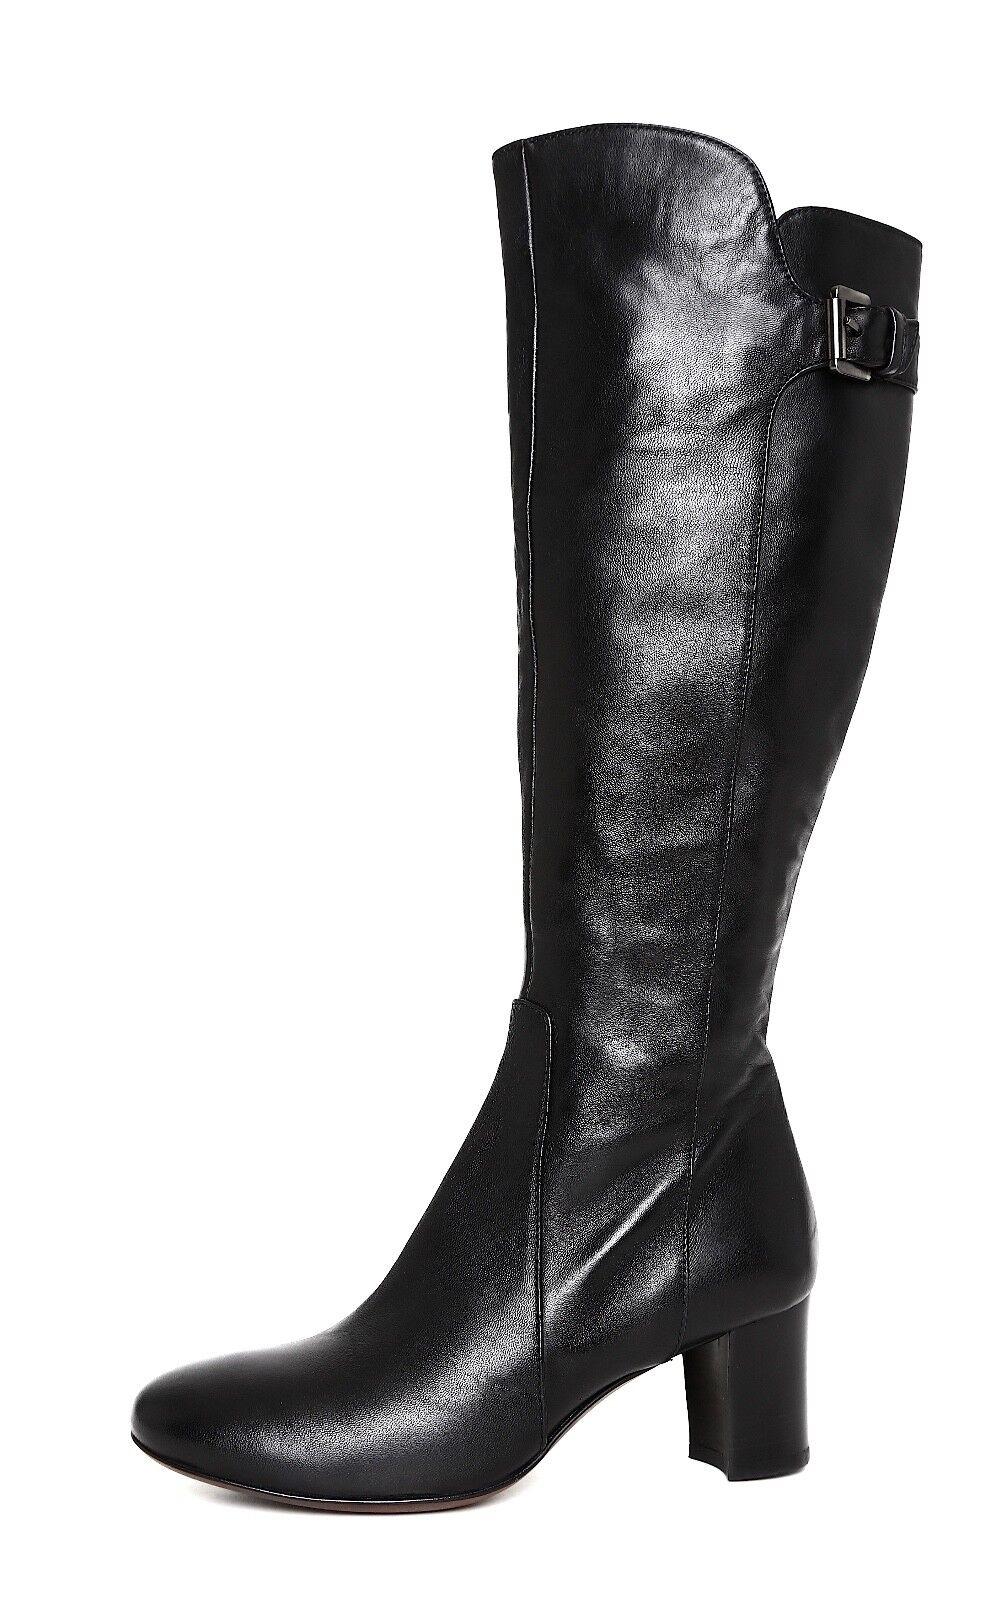 Attilio Giusti Leombruni Side Zip Leather Boot Black Women Sz 37 *